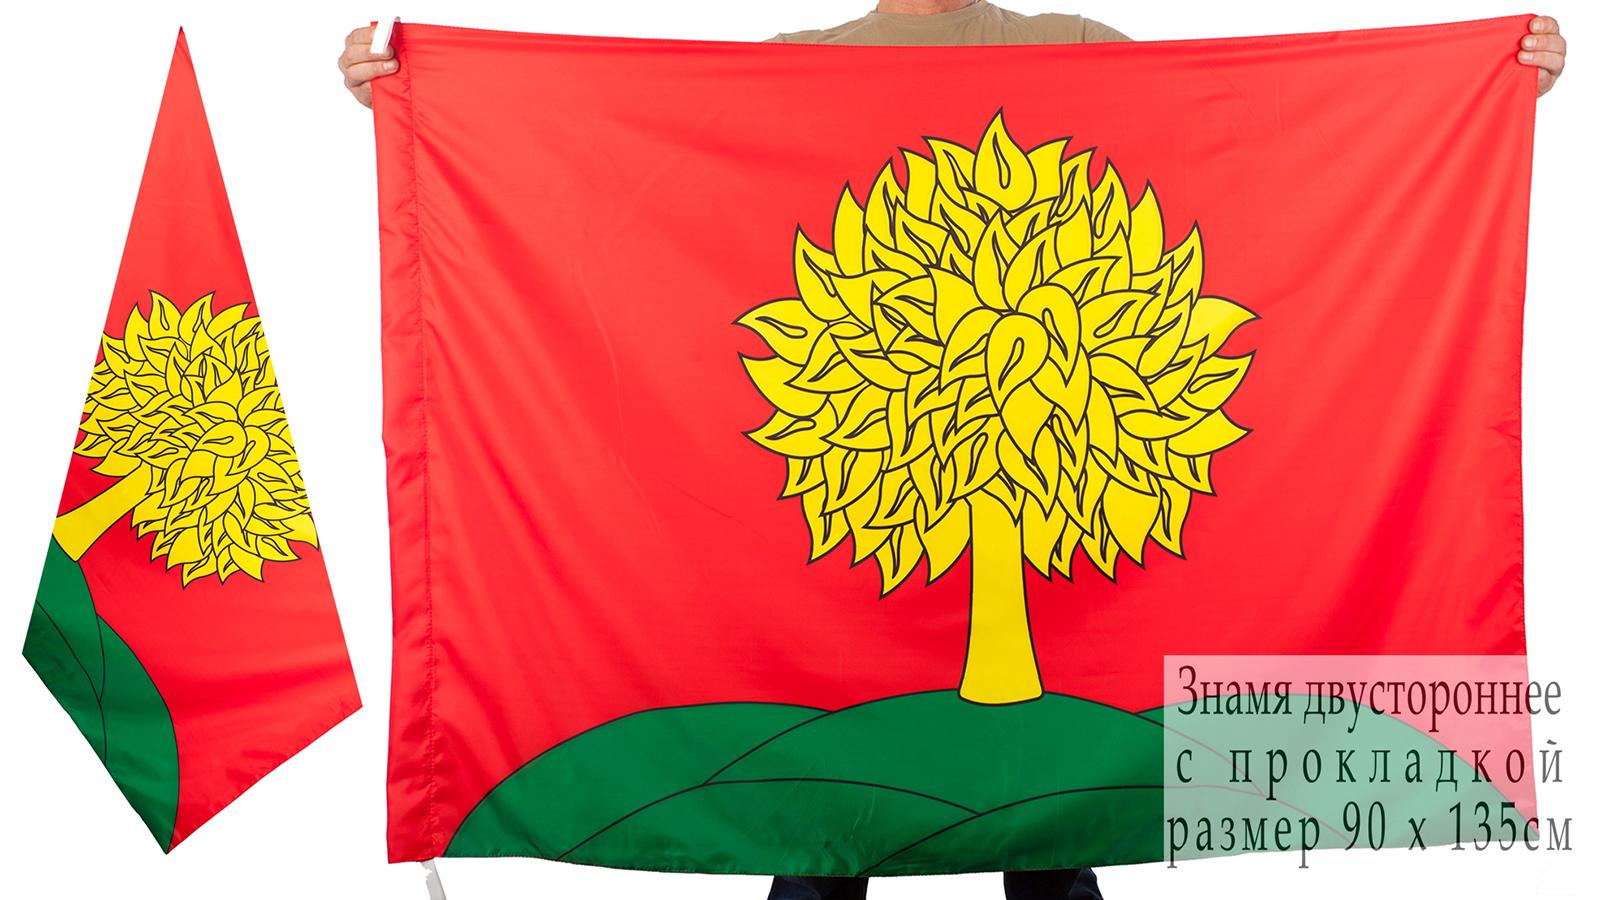 Двухсторонний флаг Липецкой области